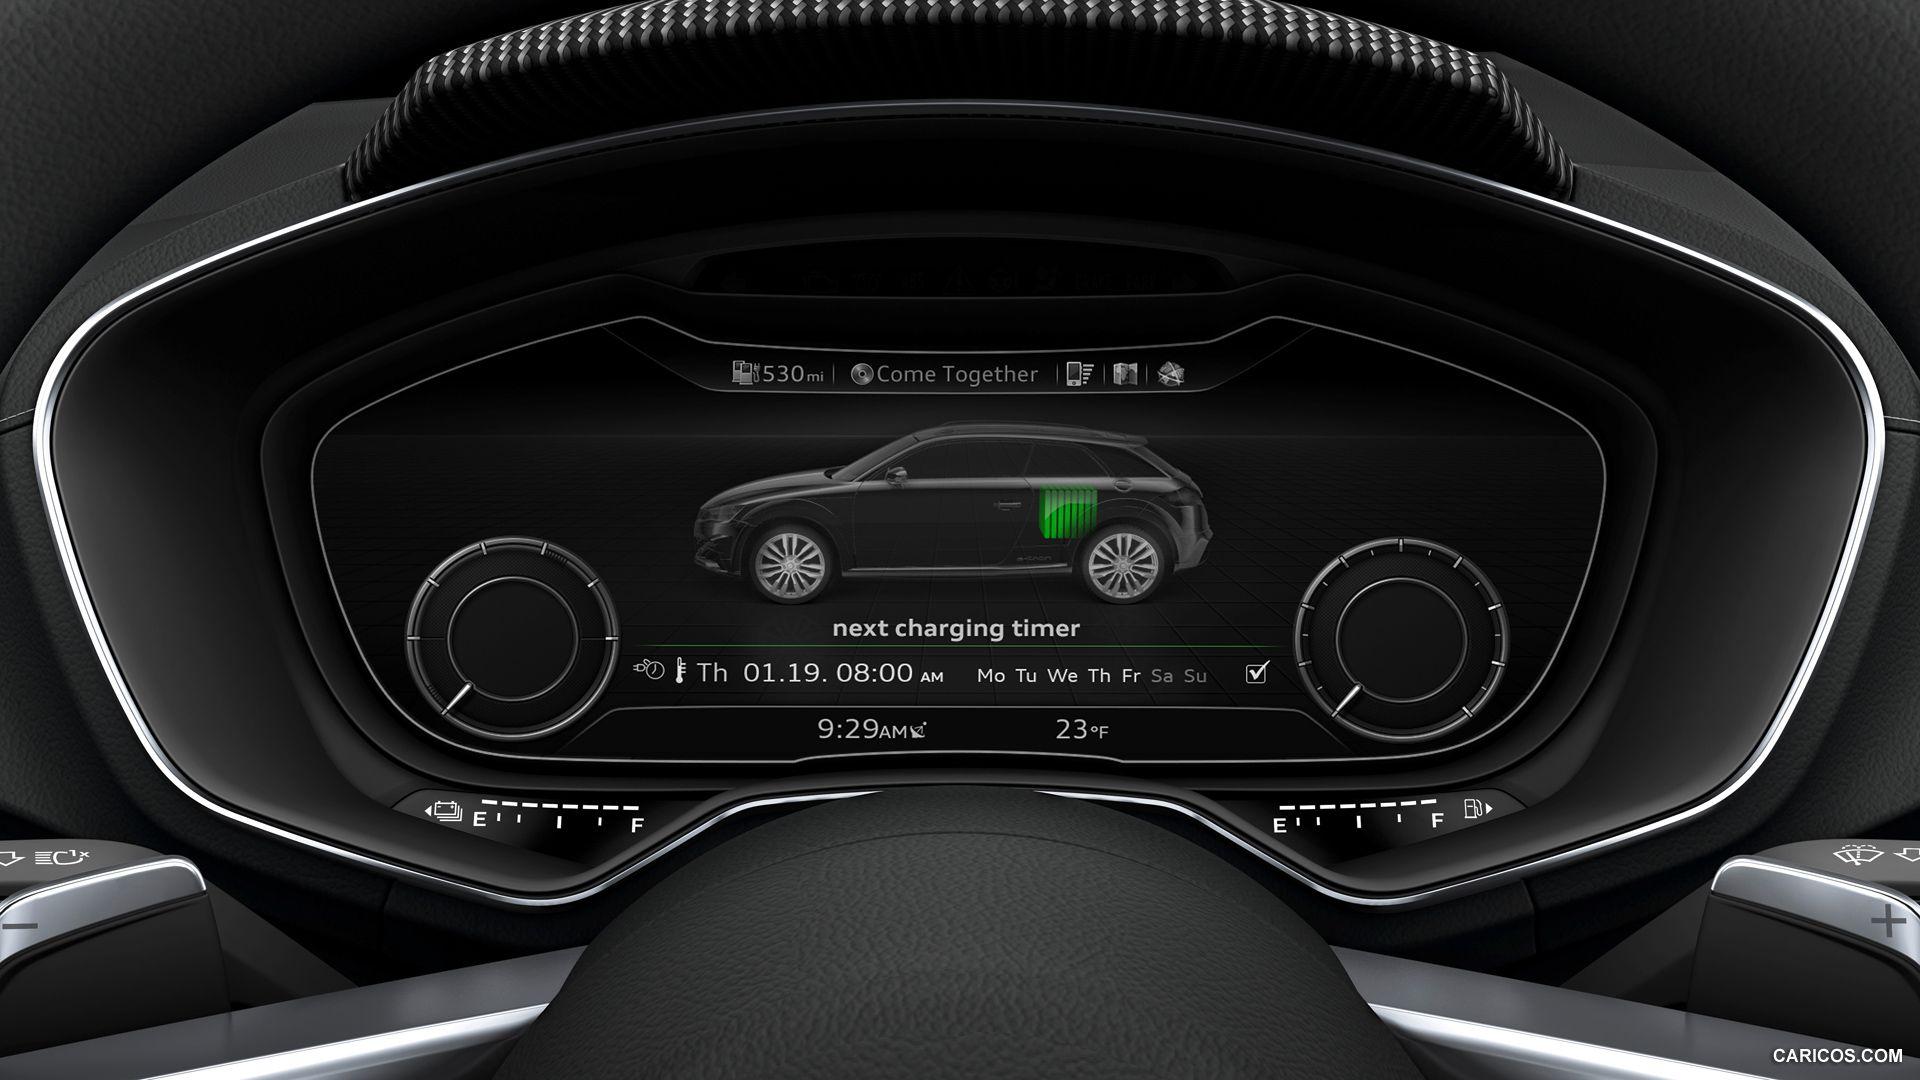 Audi Allroad Shooting Brake Concept 2014 Instrument Cluster Hd